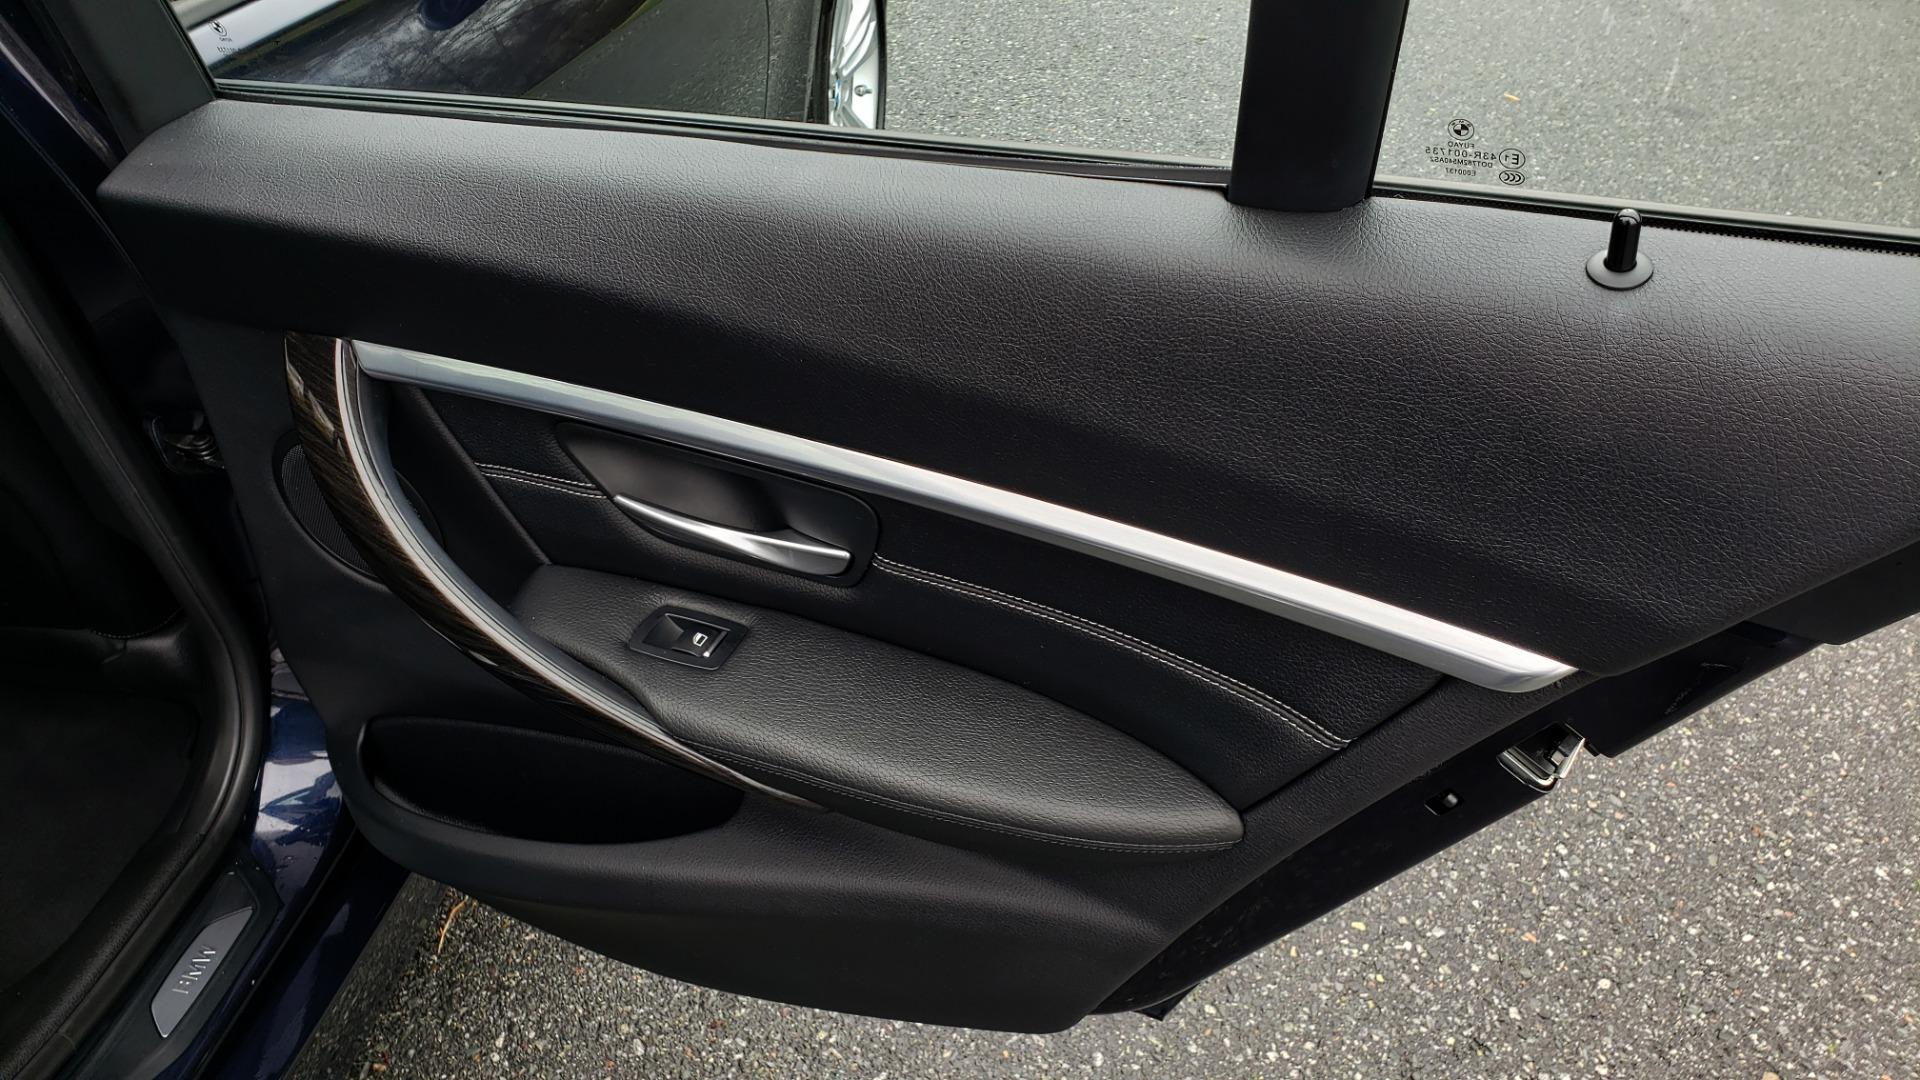 Used 2016 BMW 3 SERIES 328I PREMIUM PKG / DRVR ASST / SUNROOF / PARK ASST for sale Sold at Formula Imports in Charlotte NC 28227 64